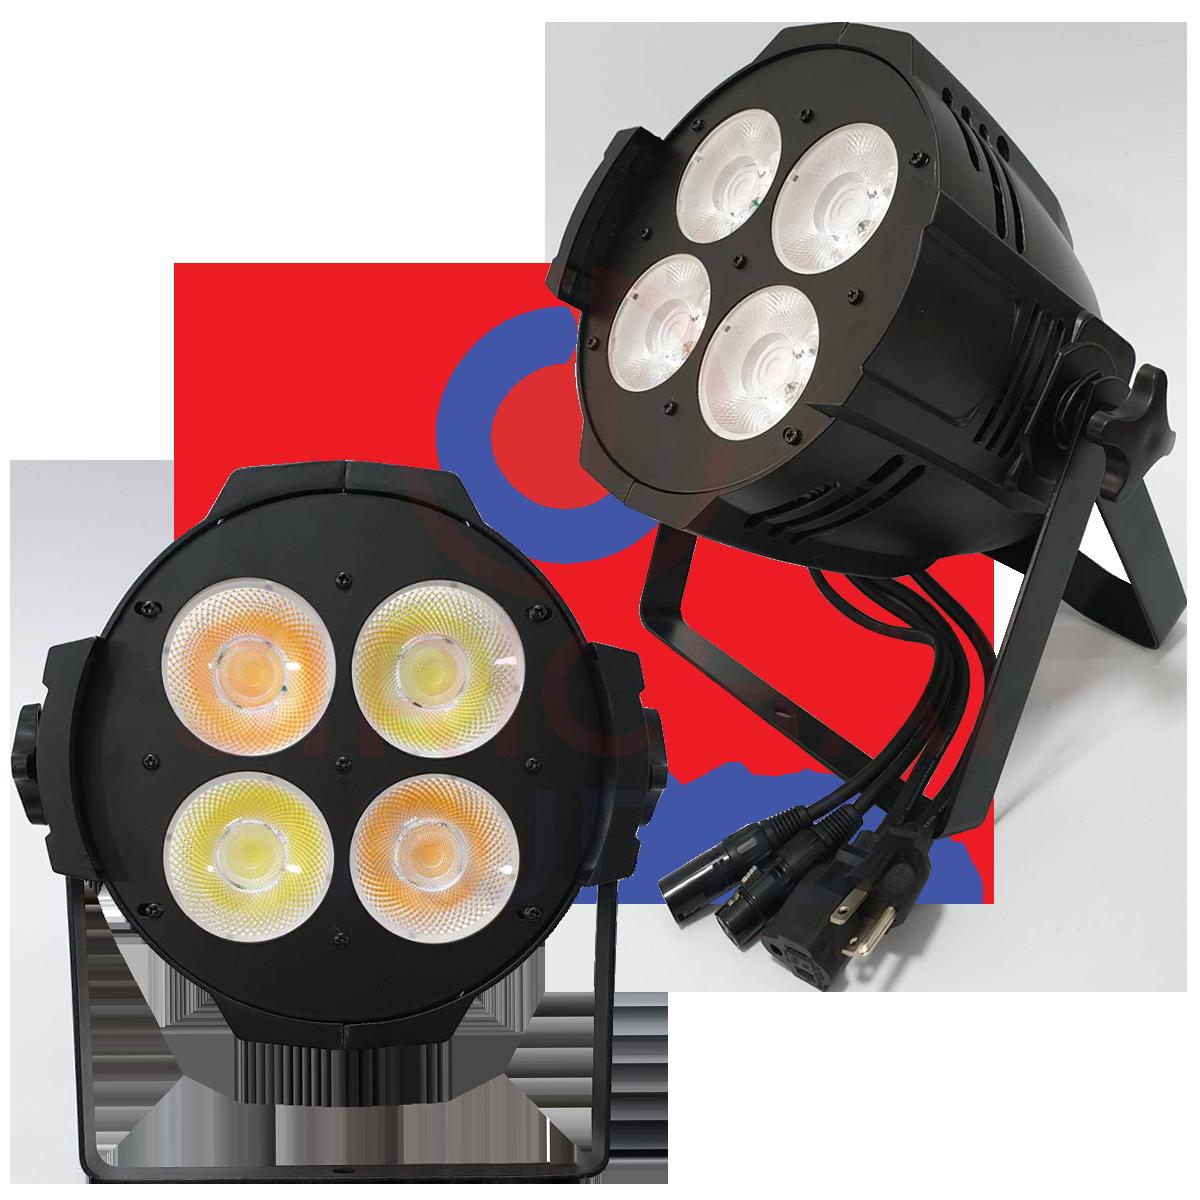 VL ไฟ COB 200W (สีขาวและสีวอม) LED 4x50